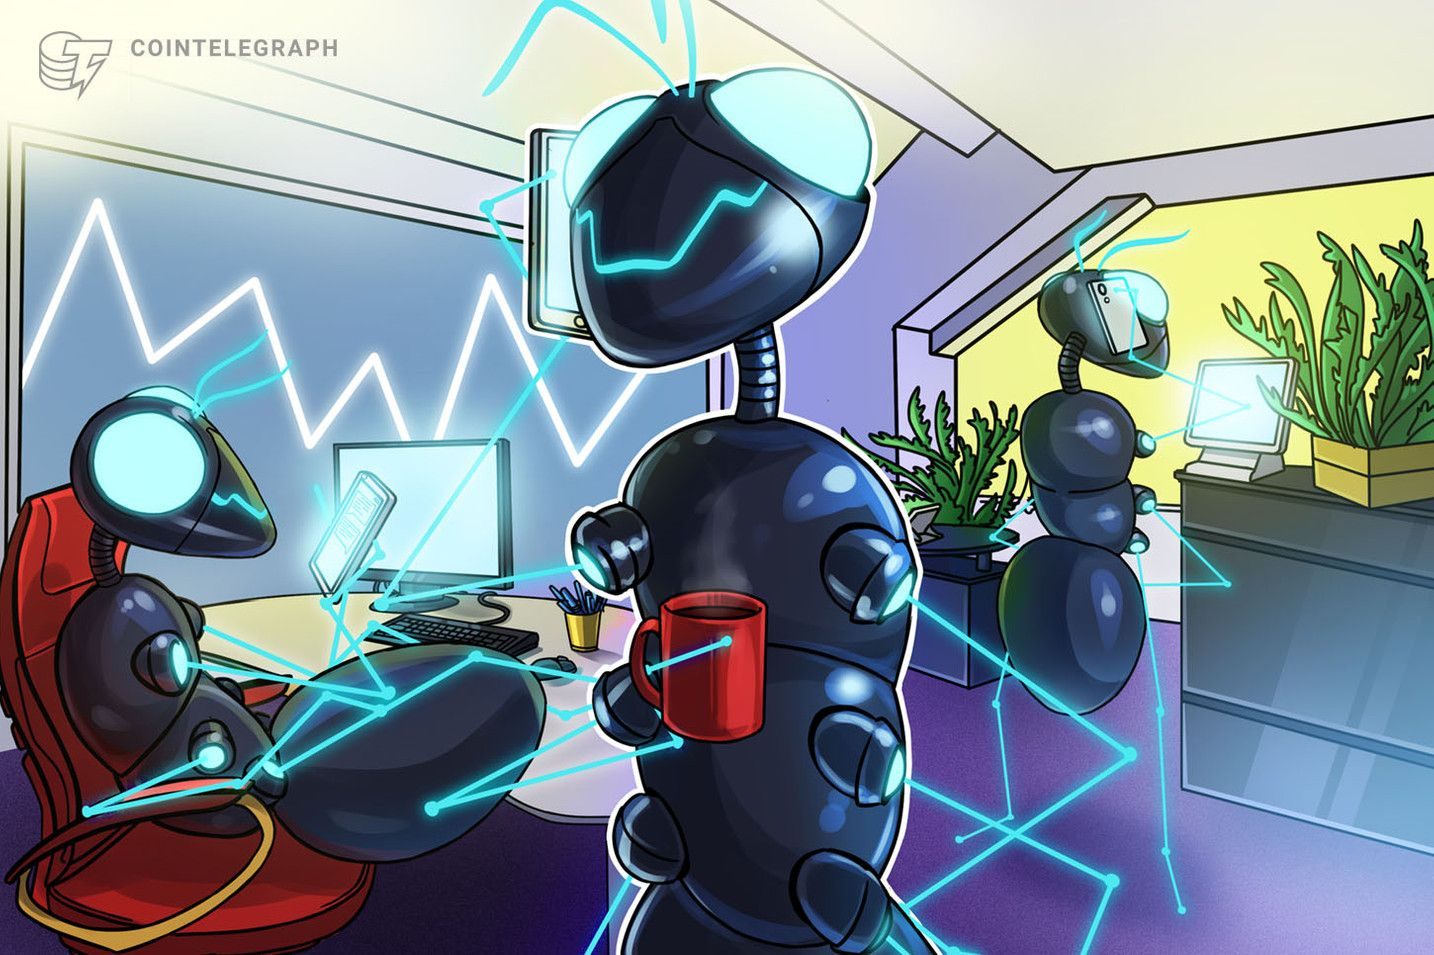 Giant thinks blockchain can make phone insurance